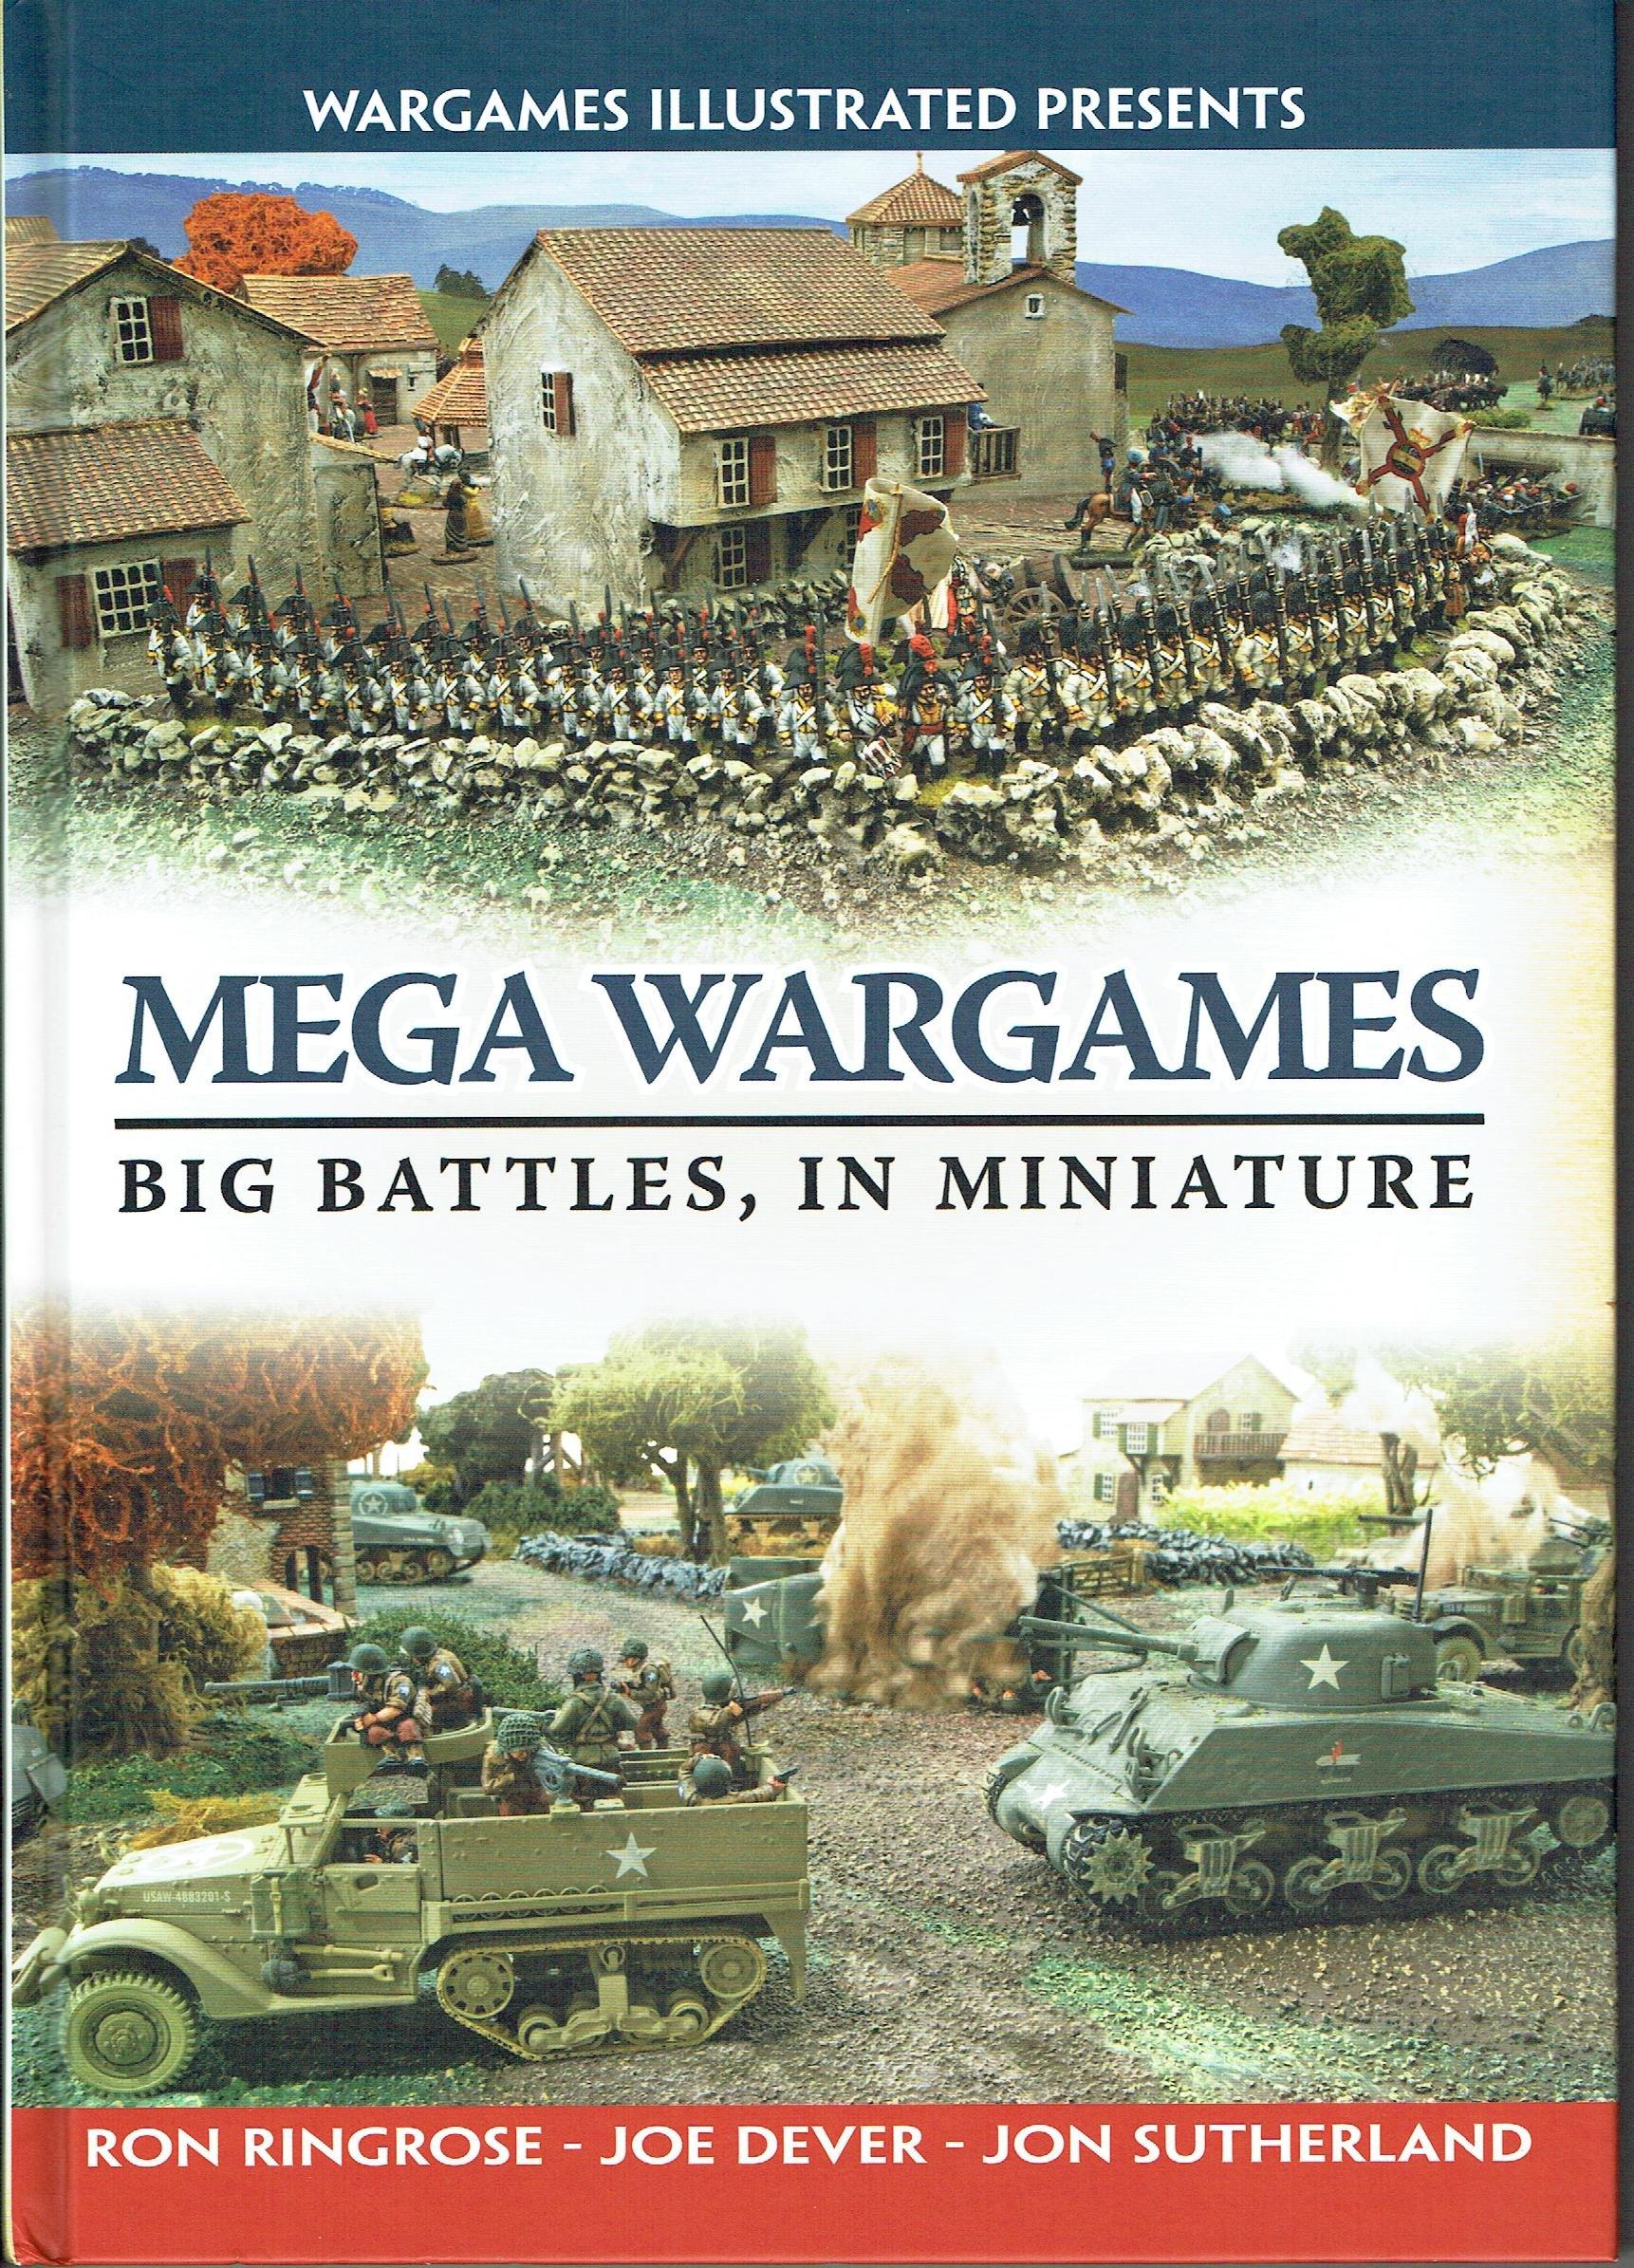 MEGA WARGAMES : BIG BATTLES, IN MINIATURE: Amazon.es: Ron Ringrose, Joe Dever, Jon Sutherland: Libros